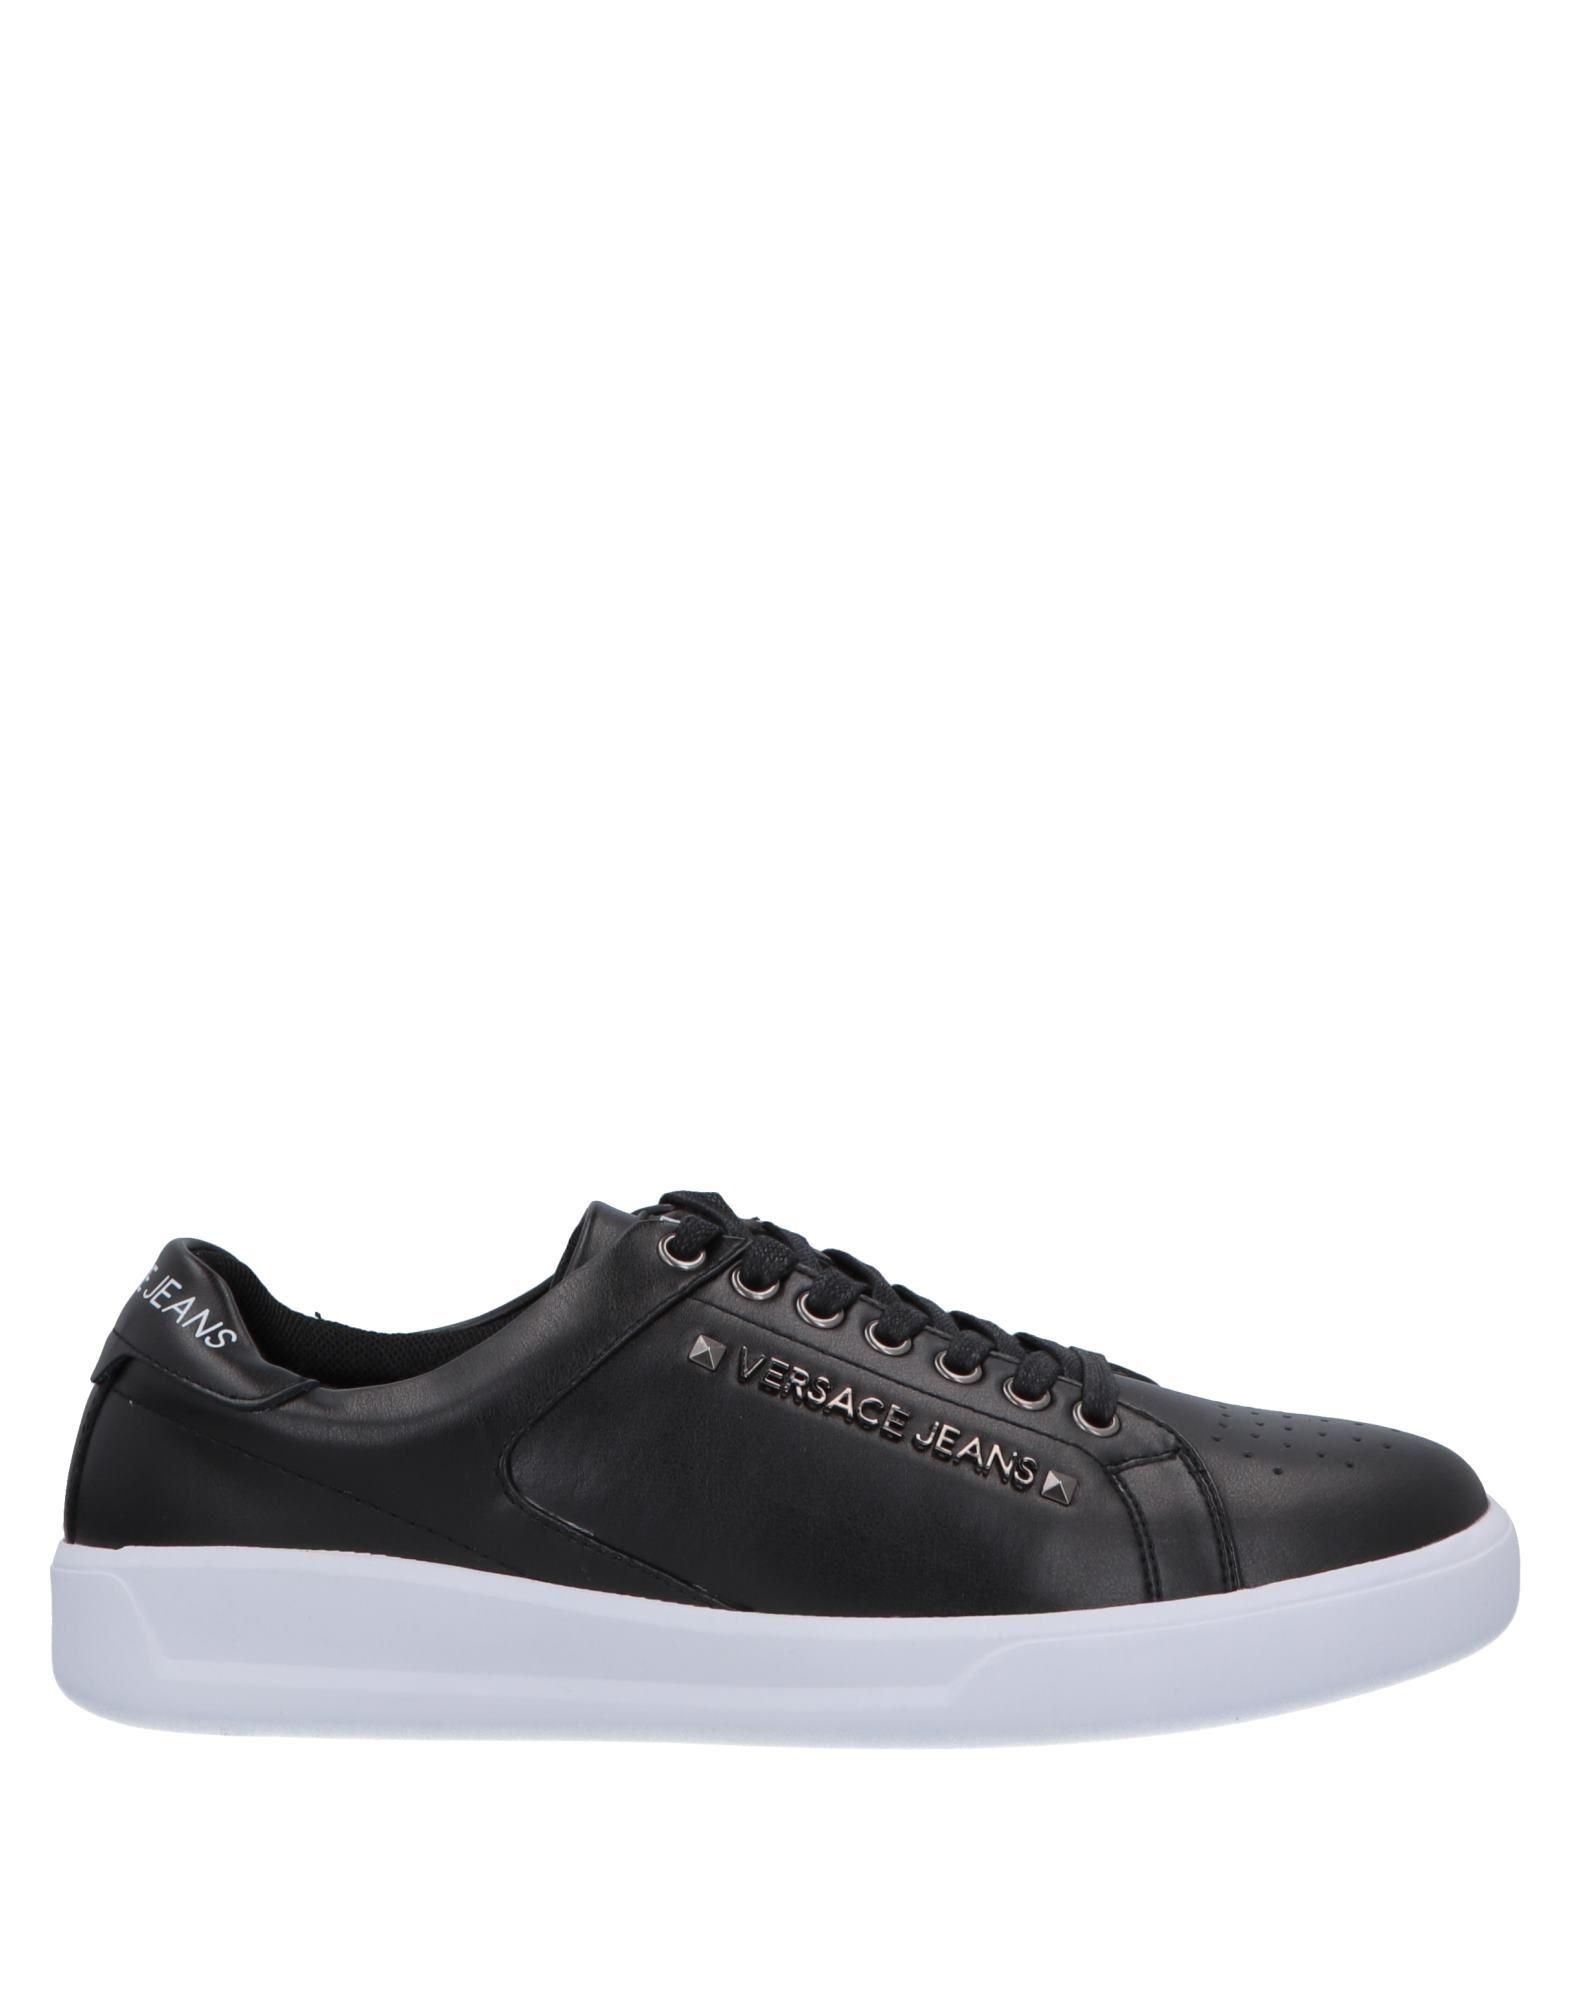 VERSACE JEANS Sneakers - Scarpe | YOOX.COM